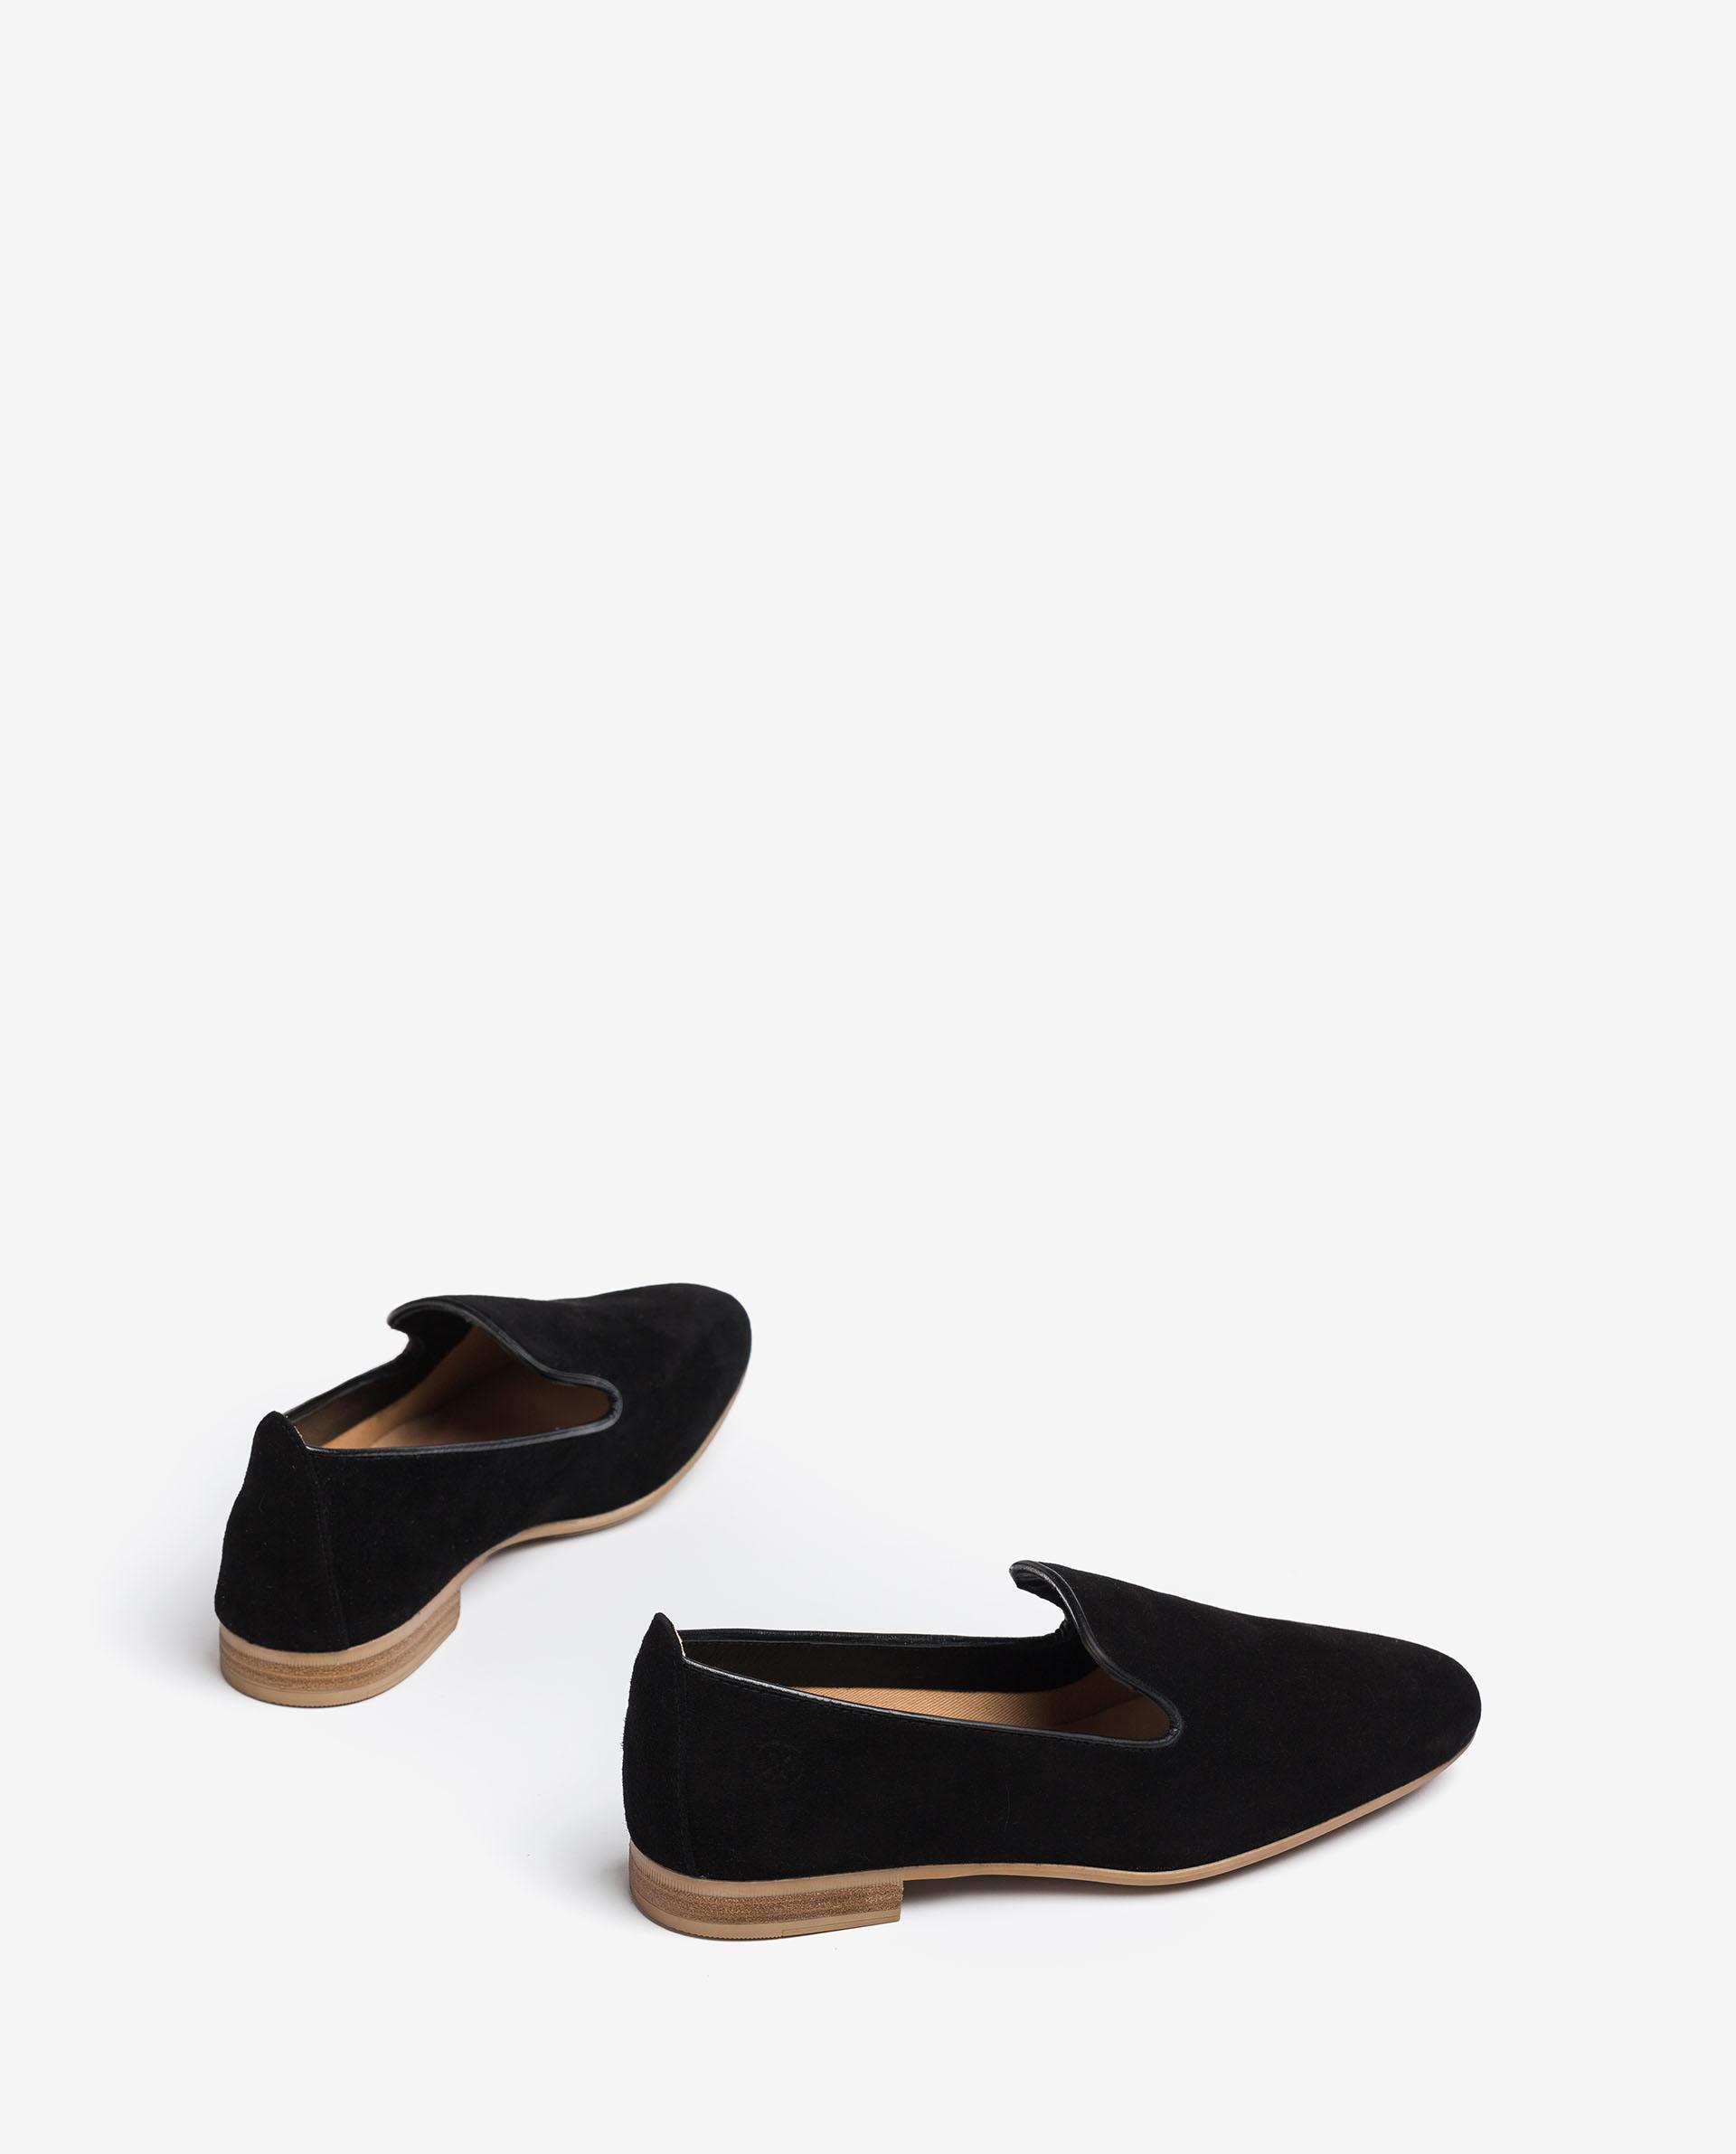 UNISA Kid suede slippers with monogram details DAYA_KS 2